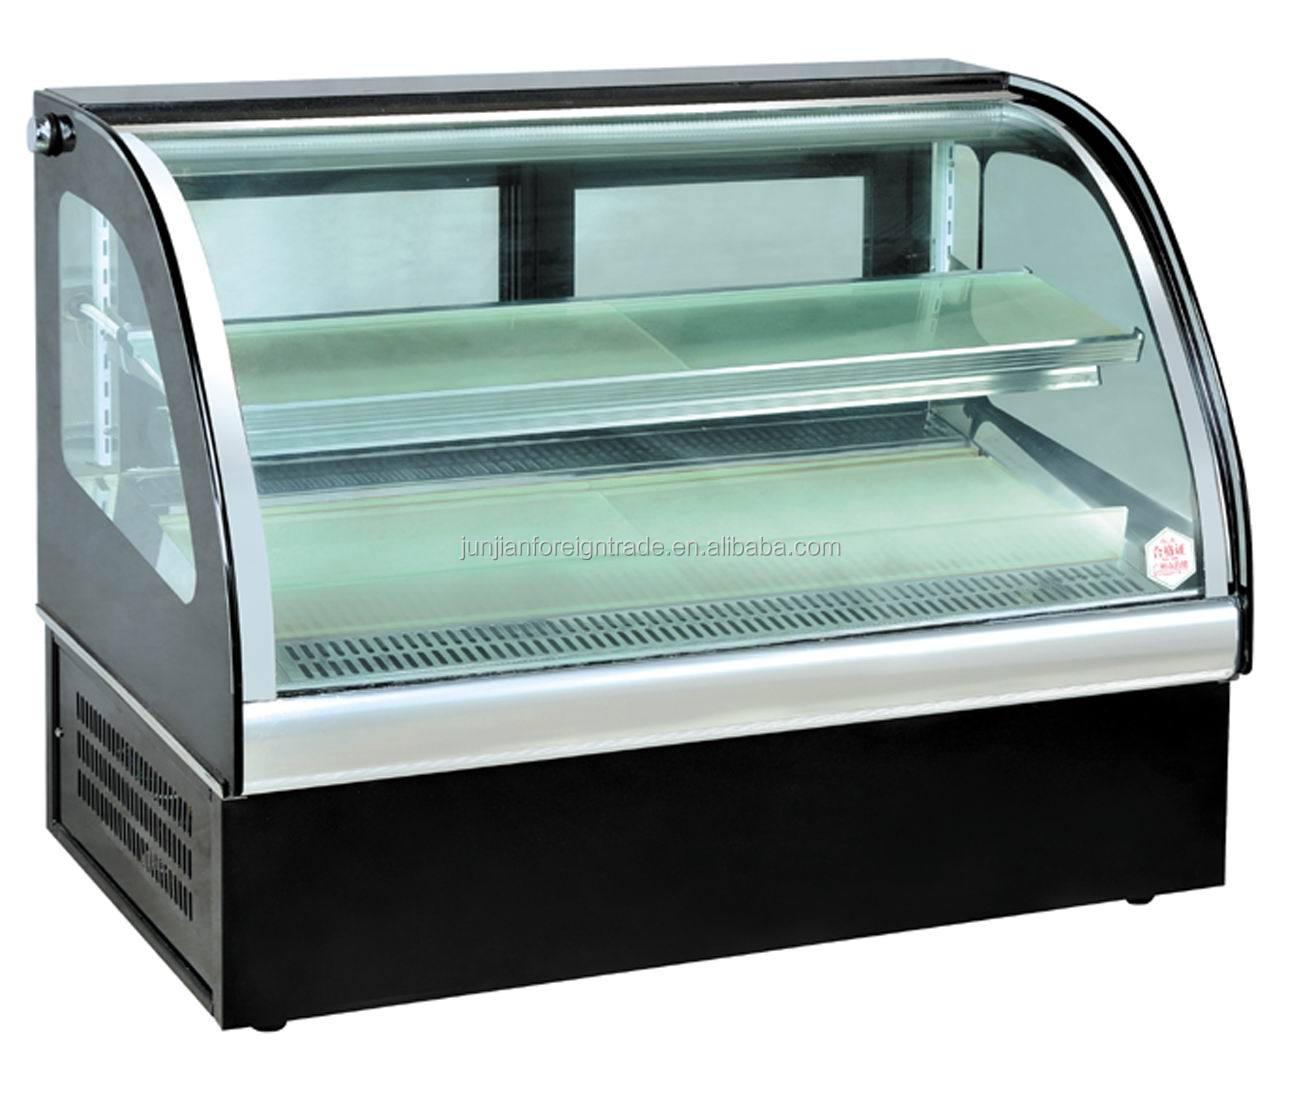 Counter Fridge Mini Counter Top Bakery Display Fridge Buy Counter Top Chiller